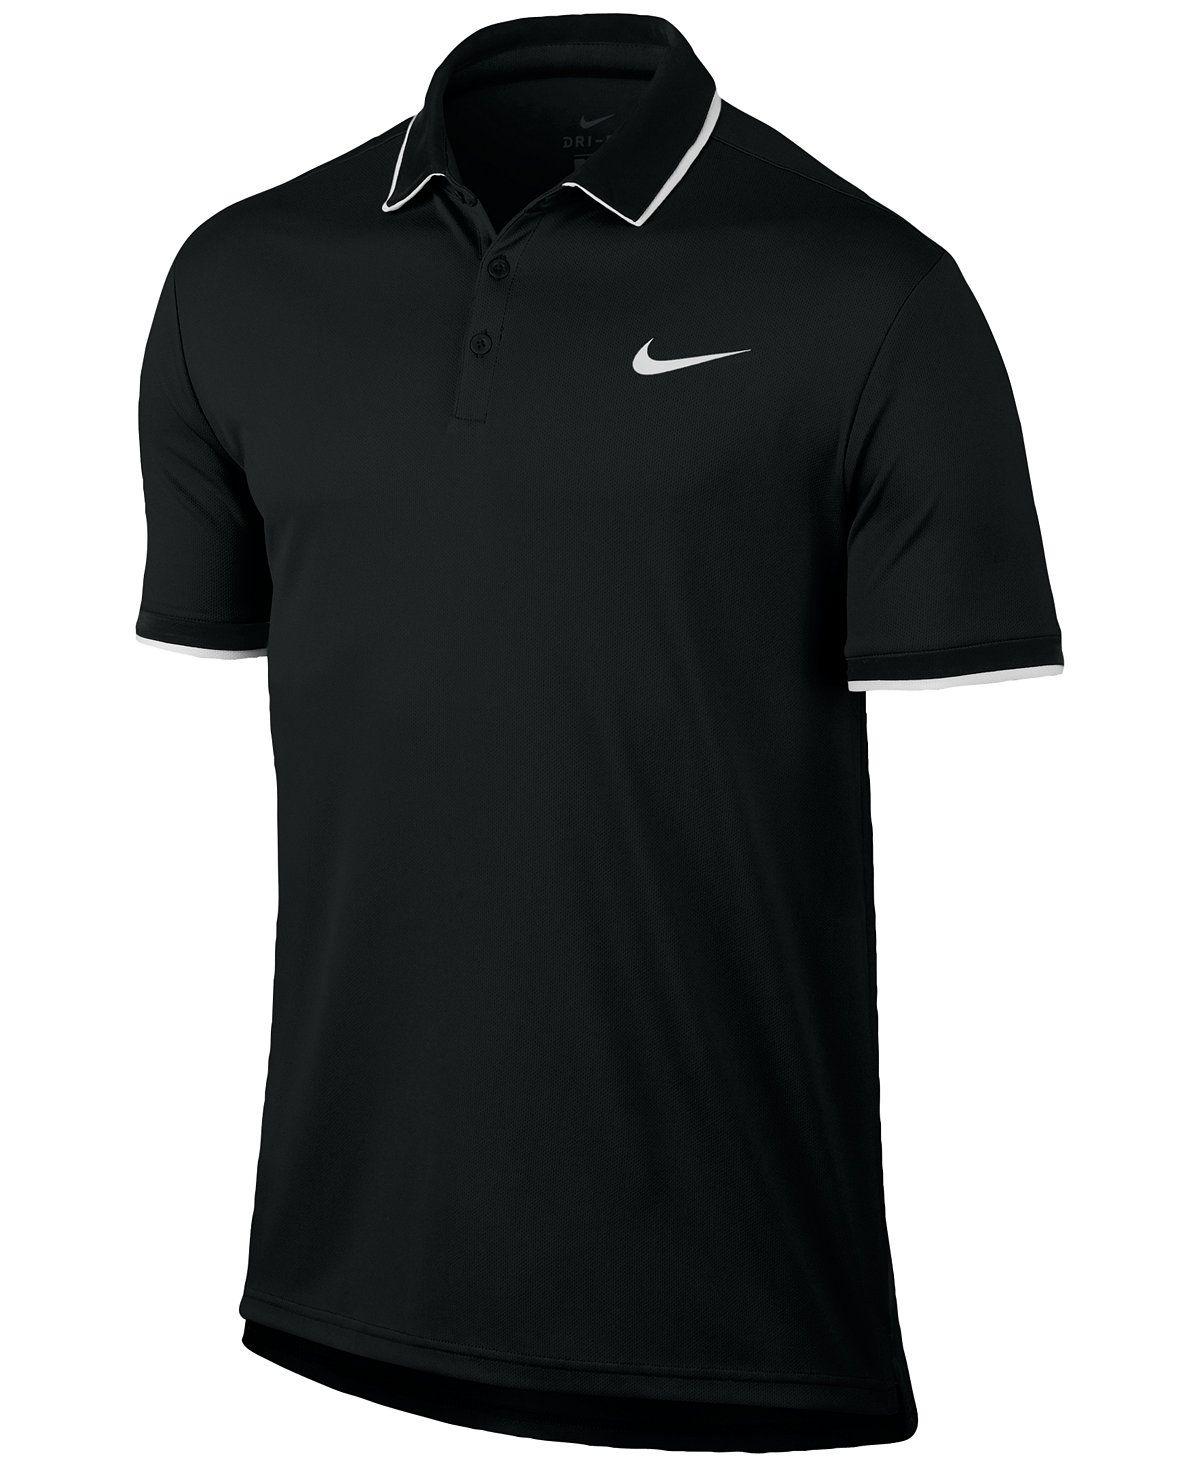 Nike Men S Court Dry Tennis Polo Polos Men Macy S Tennis Polo Nike Men Mens Outfits